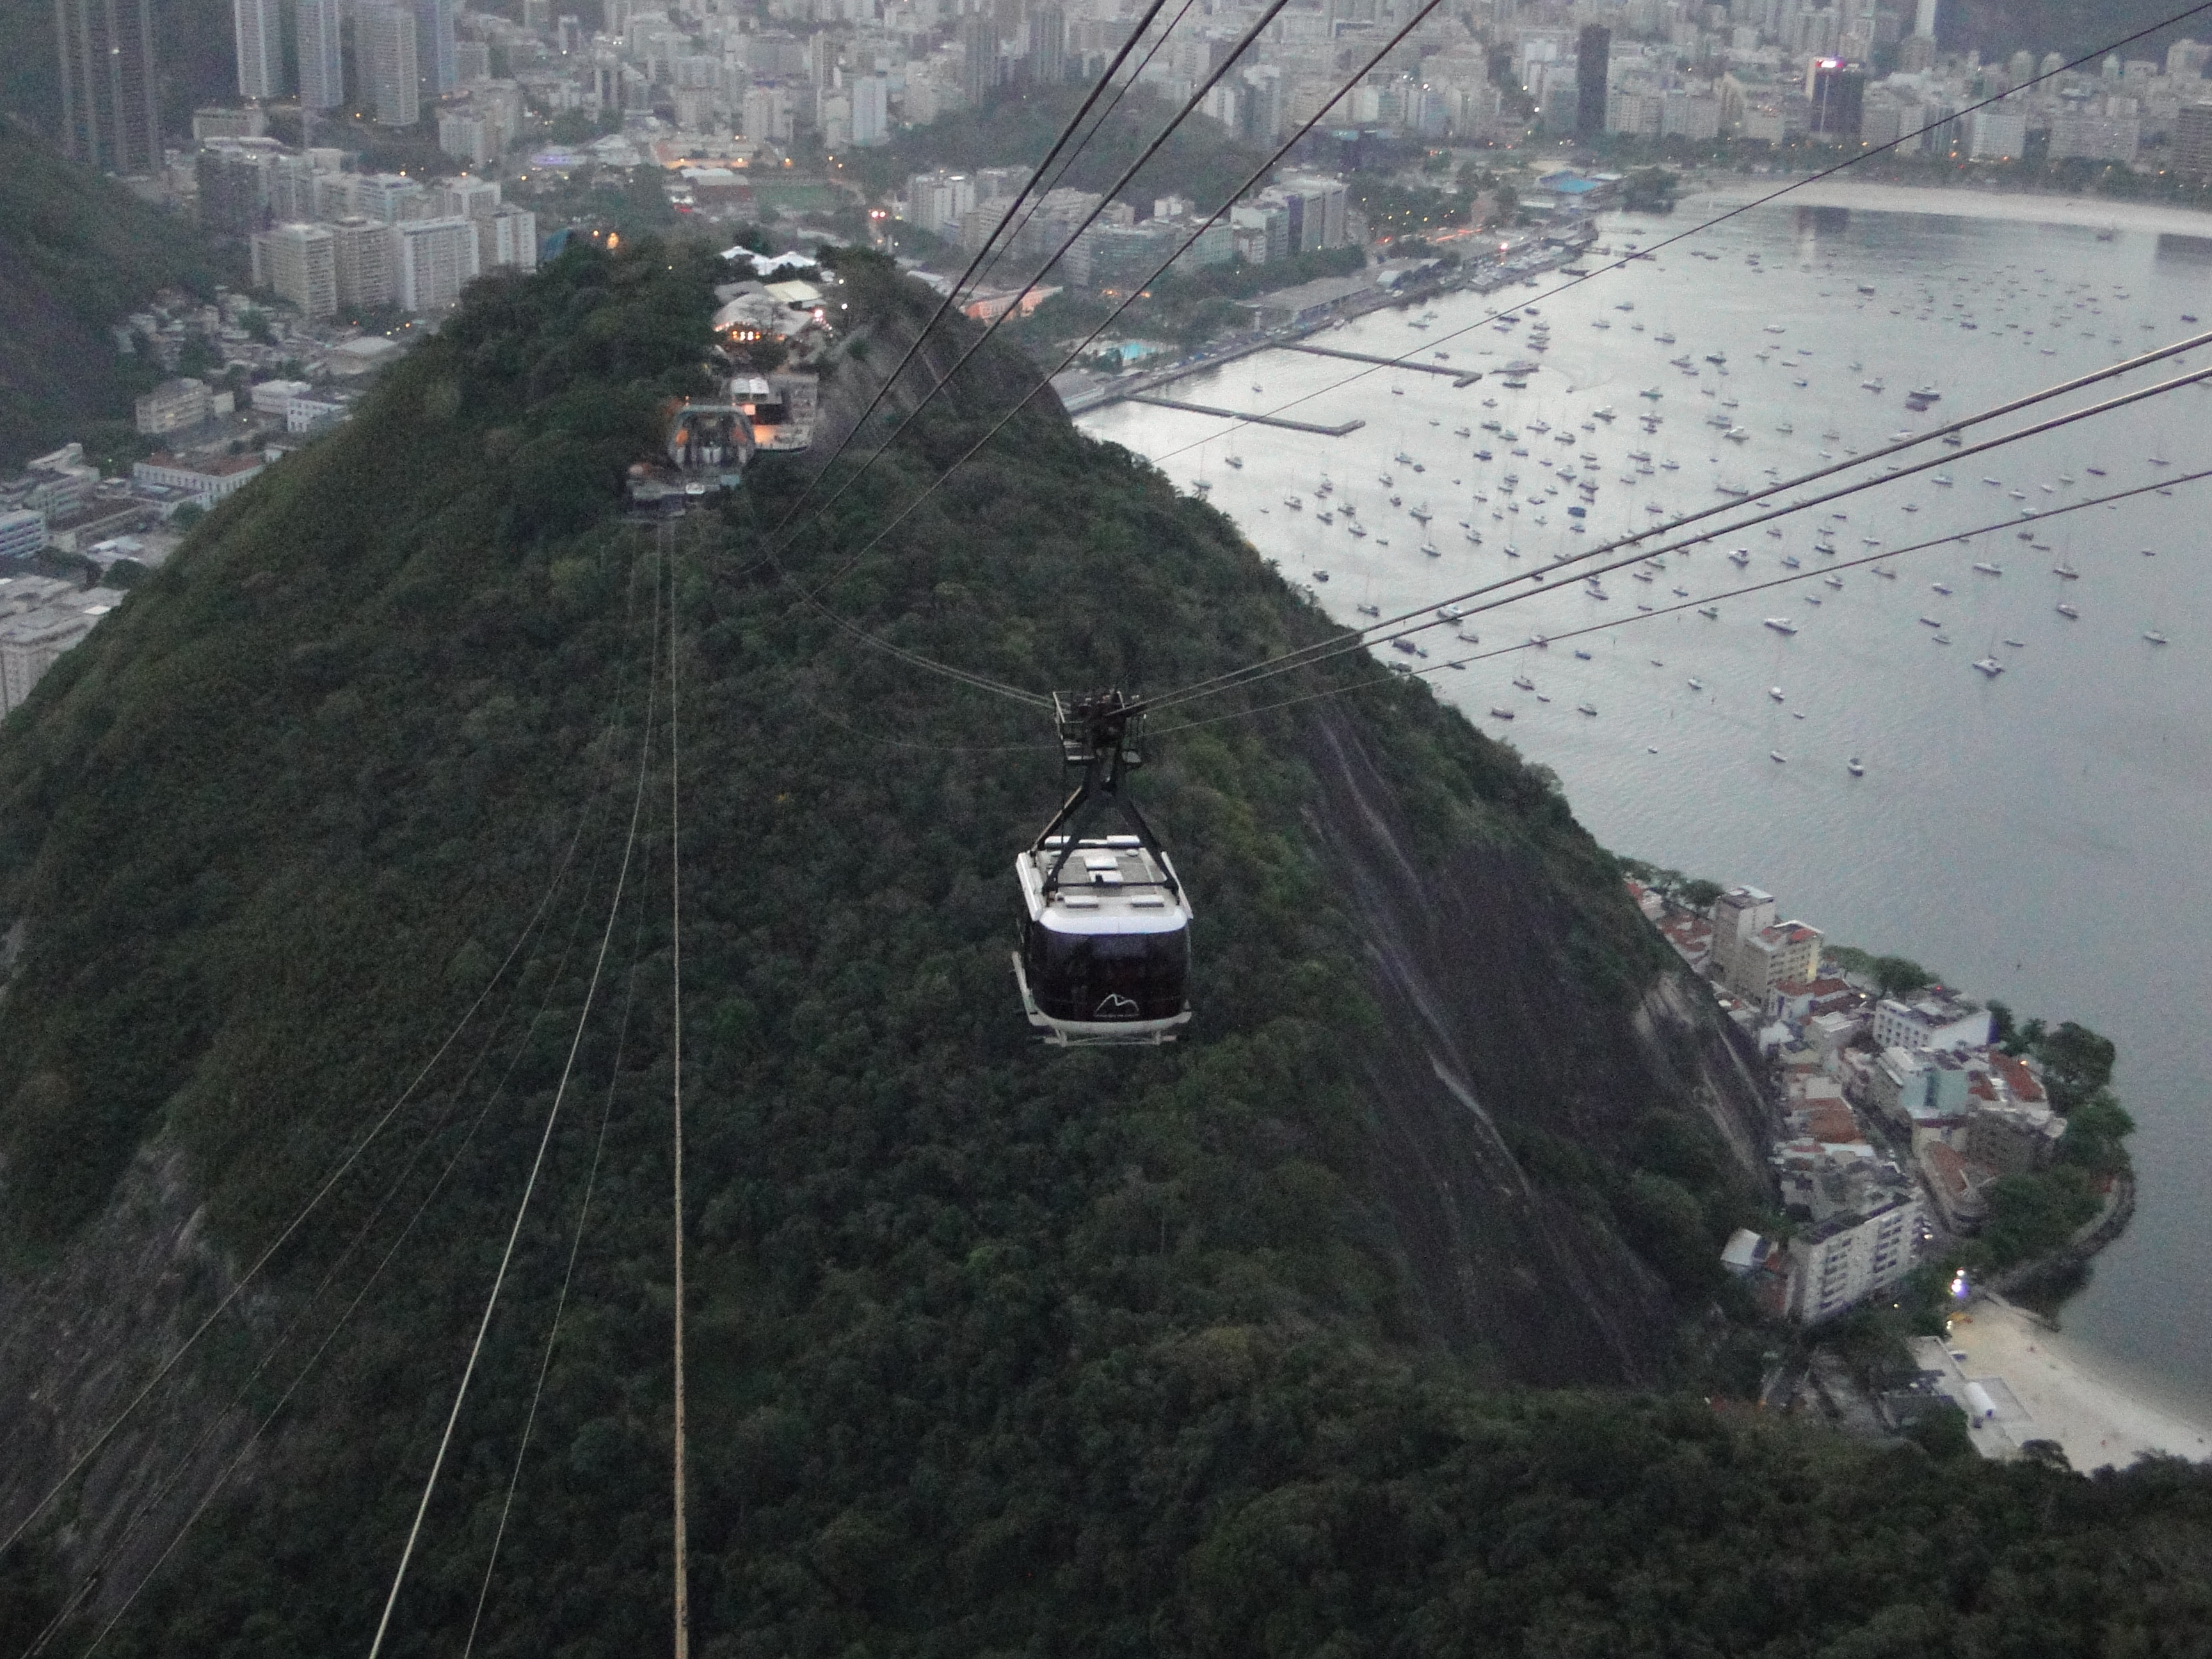 Rio de Janeiro, My Trophy | Expedition Hobo